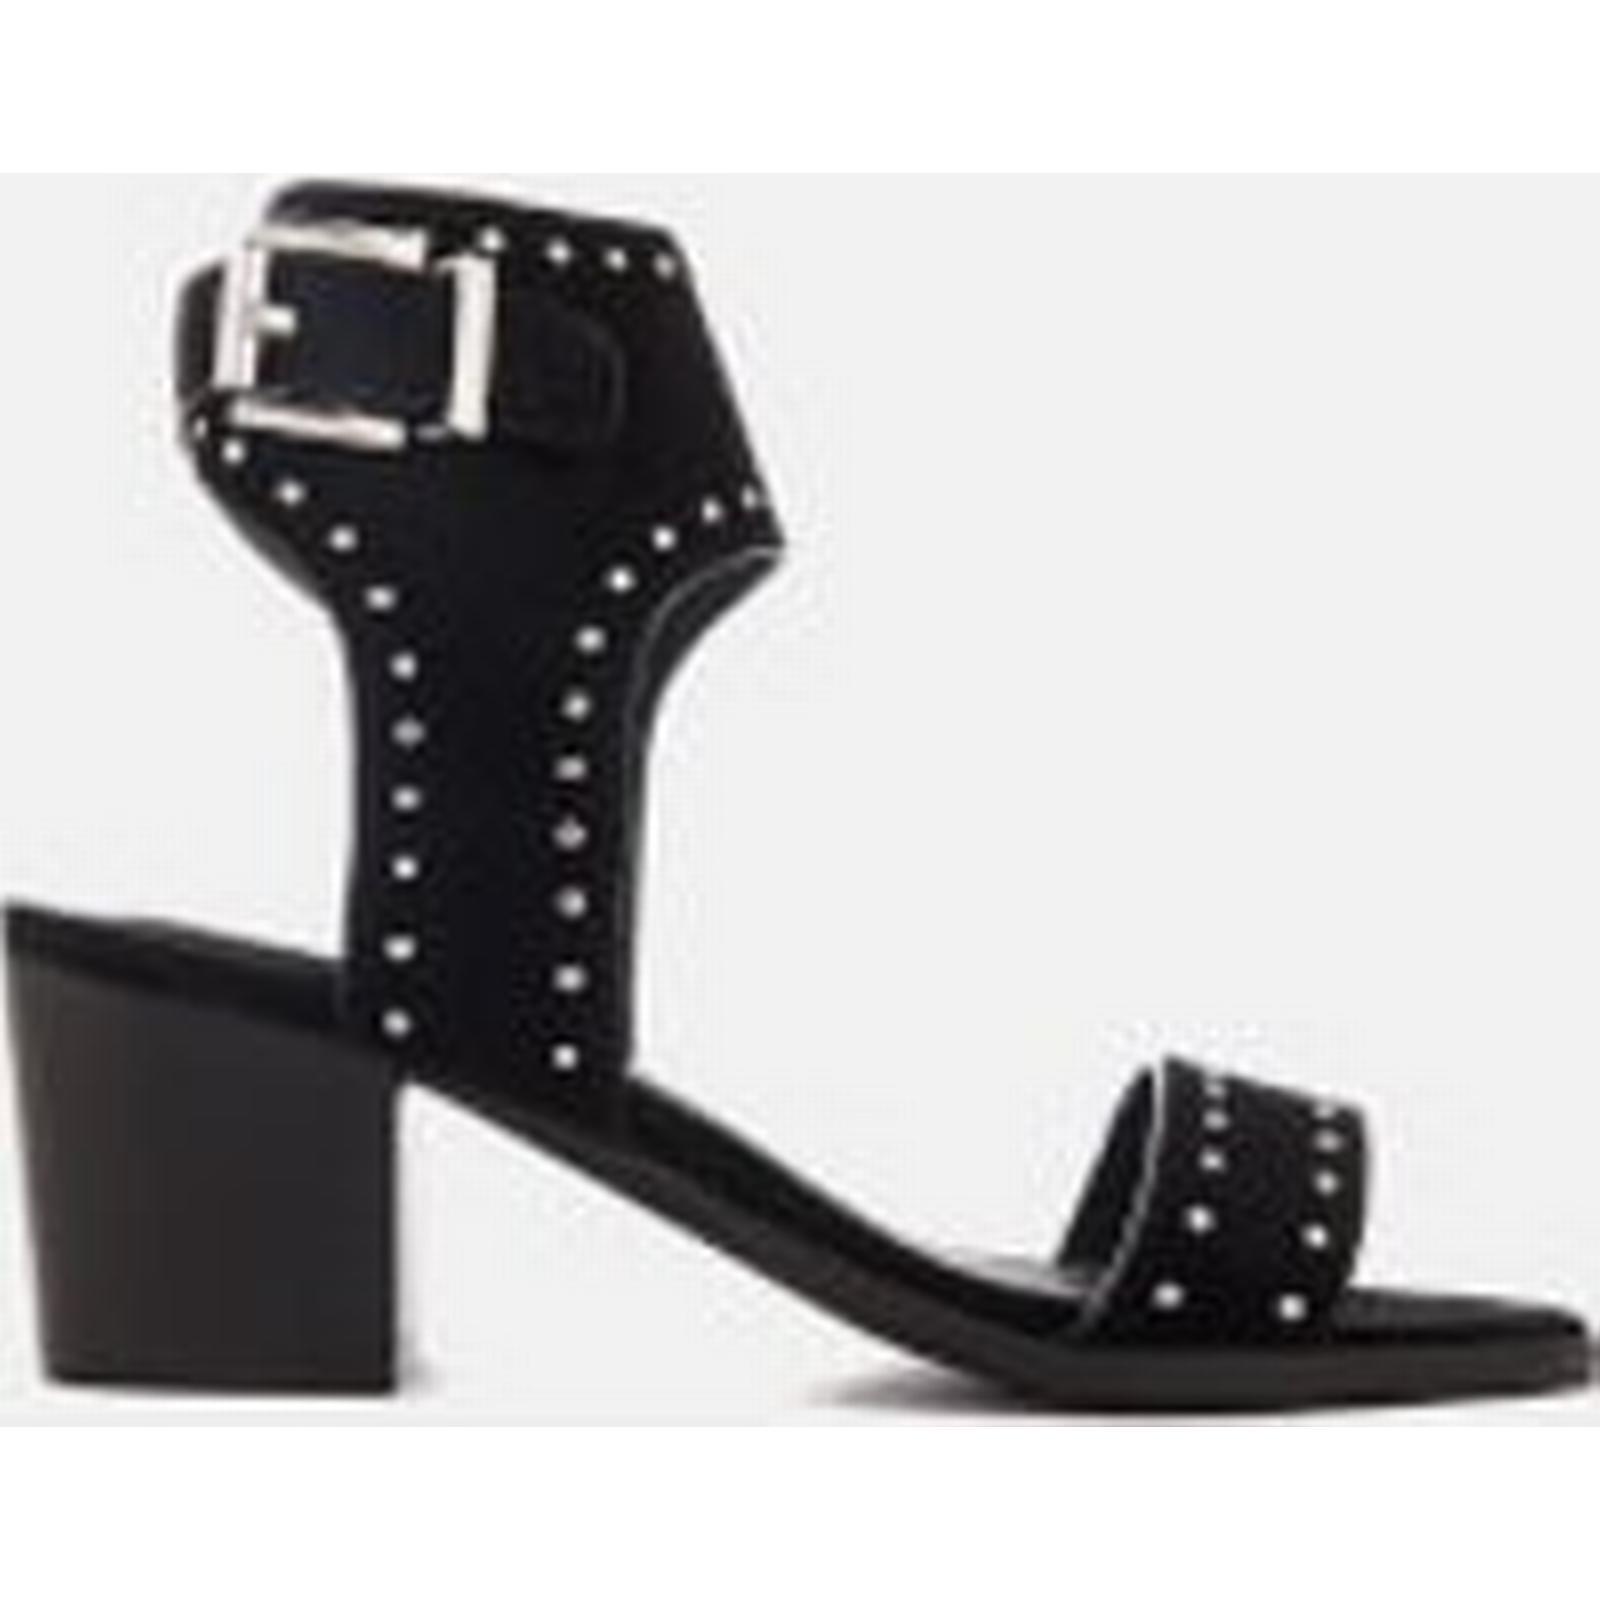 Sol Heeled Sana Women's Bev Suede Heeled Sol Sandals - Black Stud 8645c9